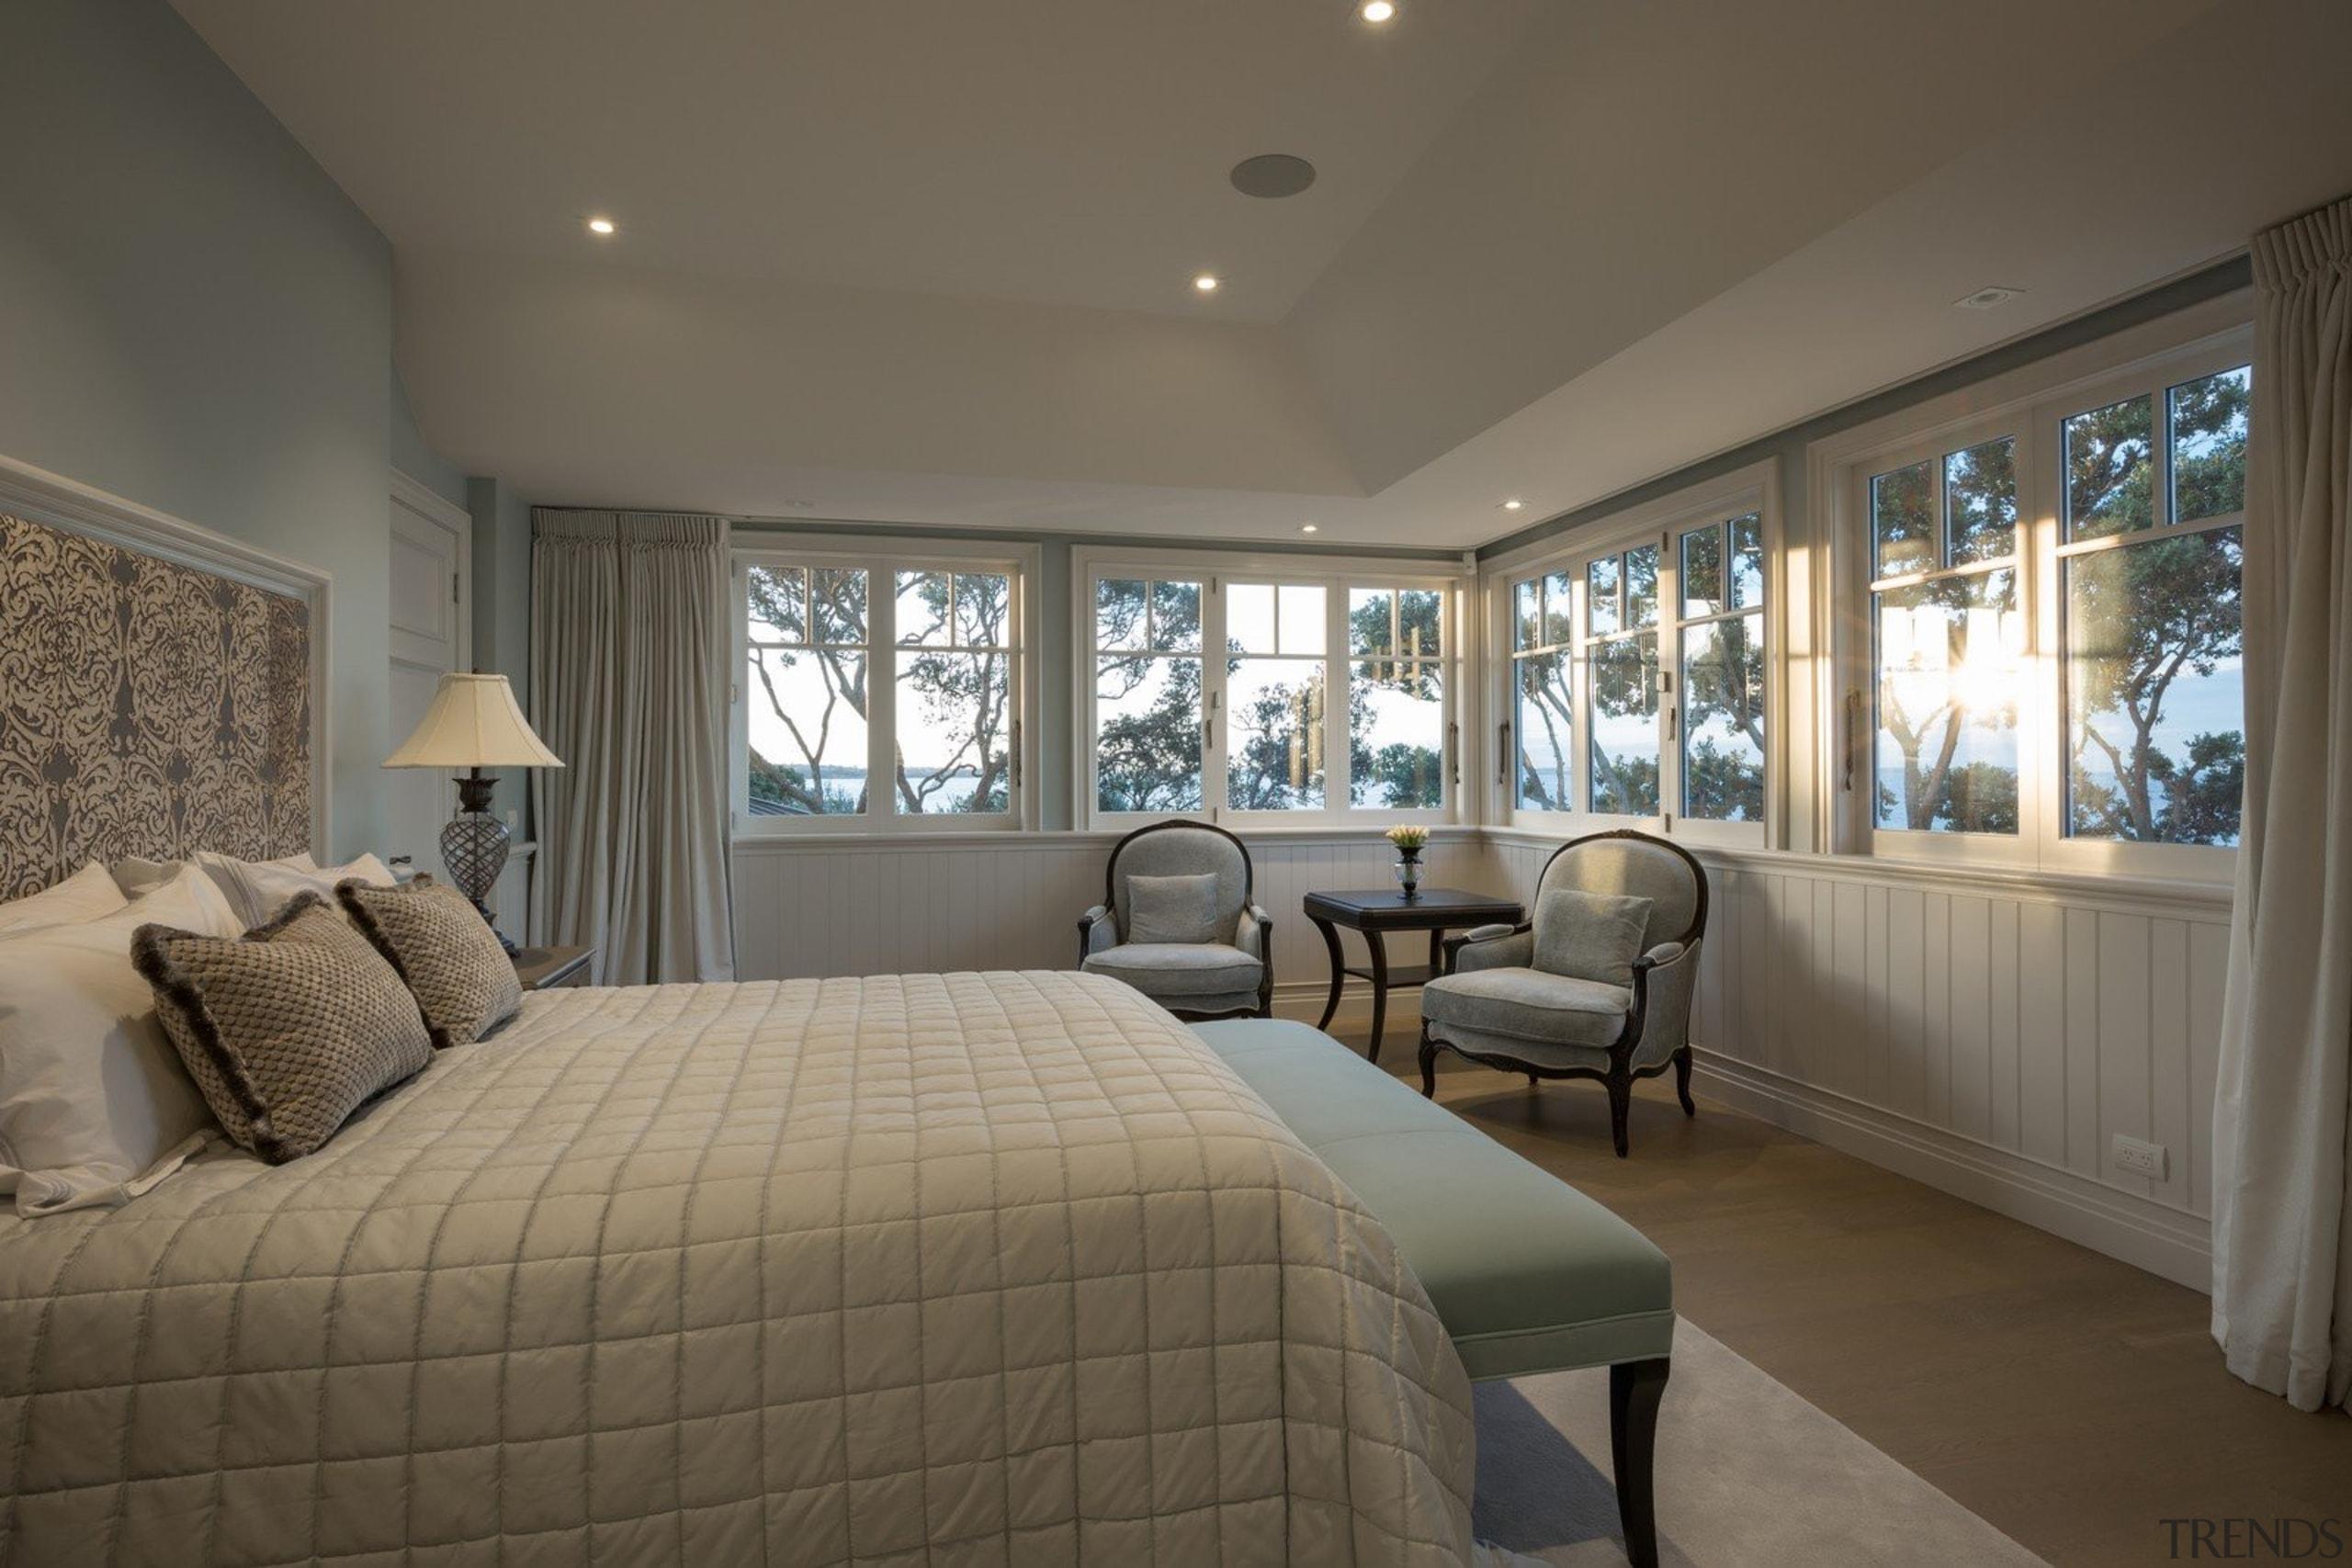 Master bedroom - Master bedroom - bedroom | bedroom, ceiling, estate, home, interior design, property, real estate, room, window, gray